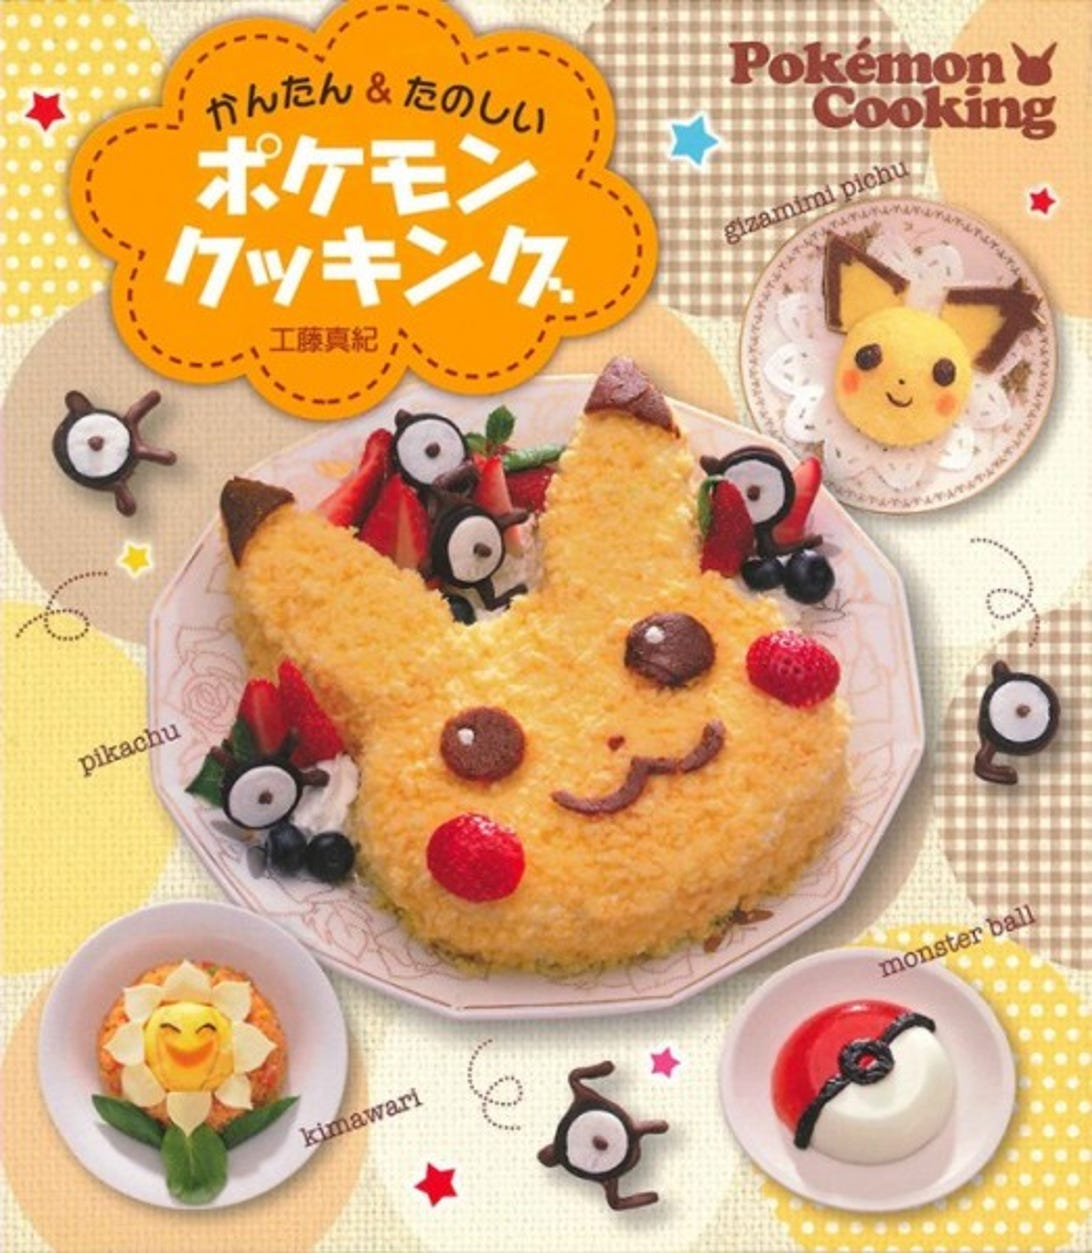 pokemoncookbook.jpg